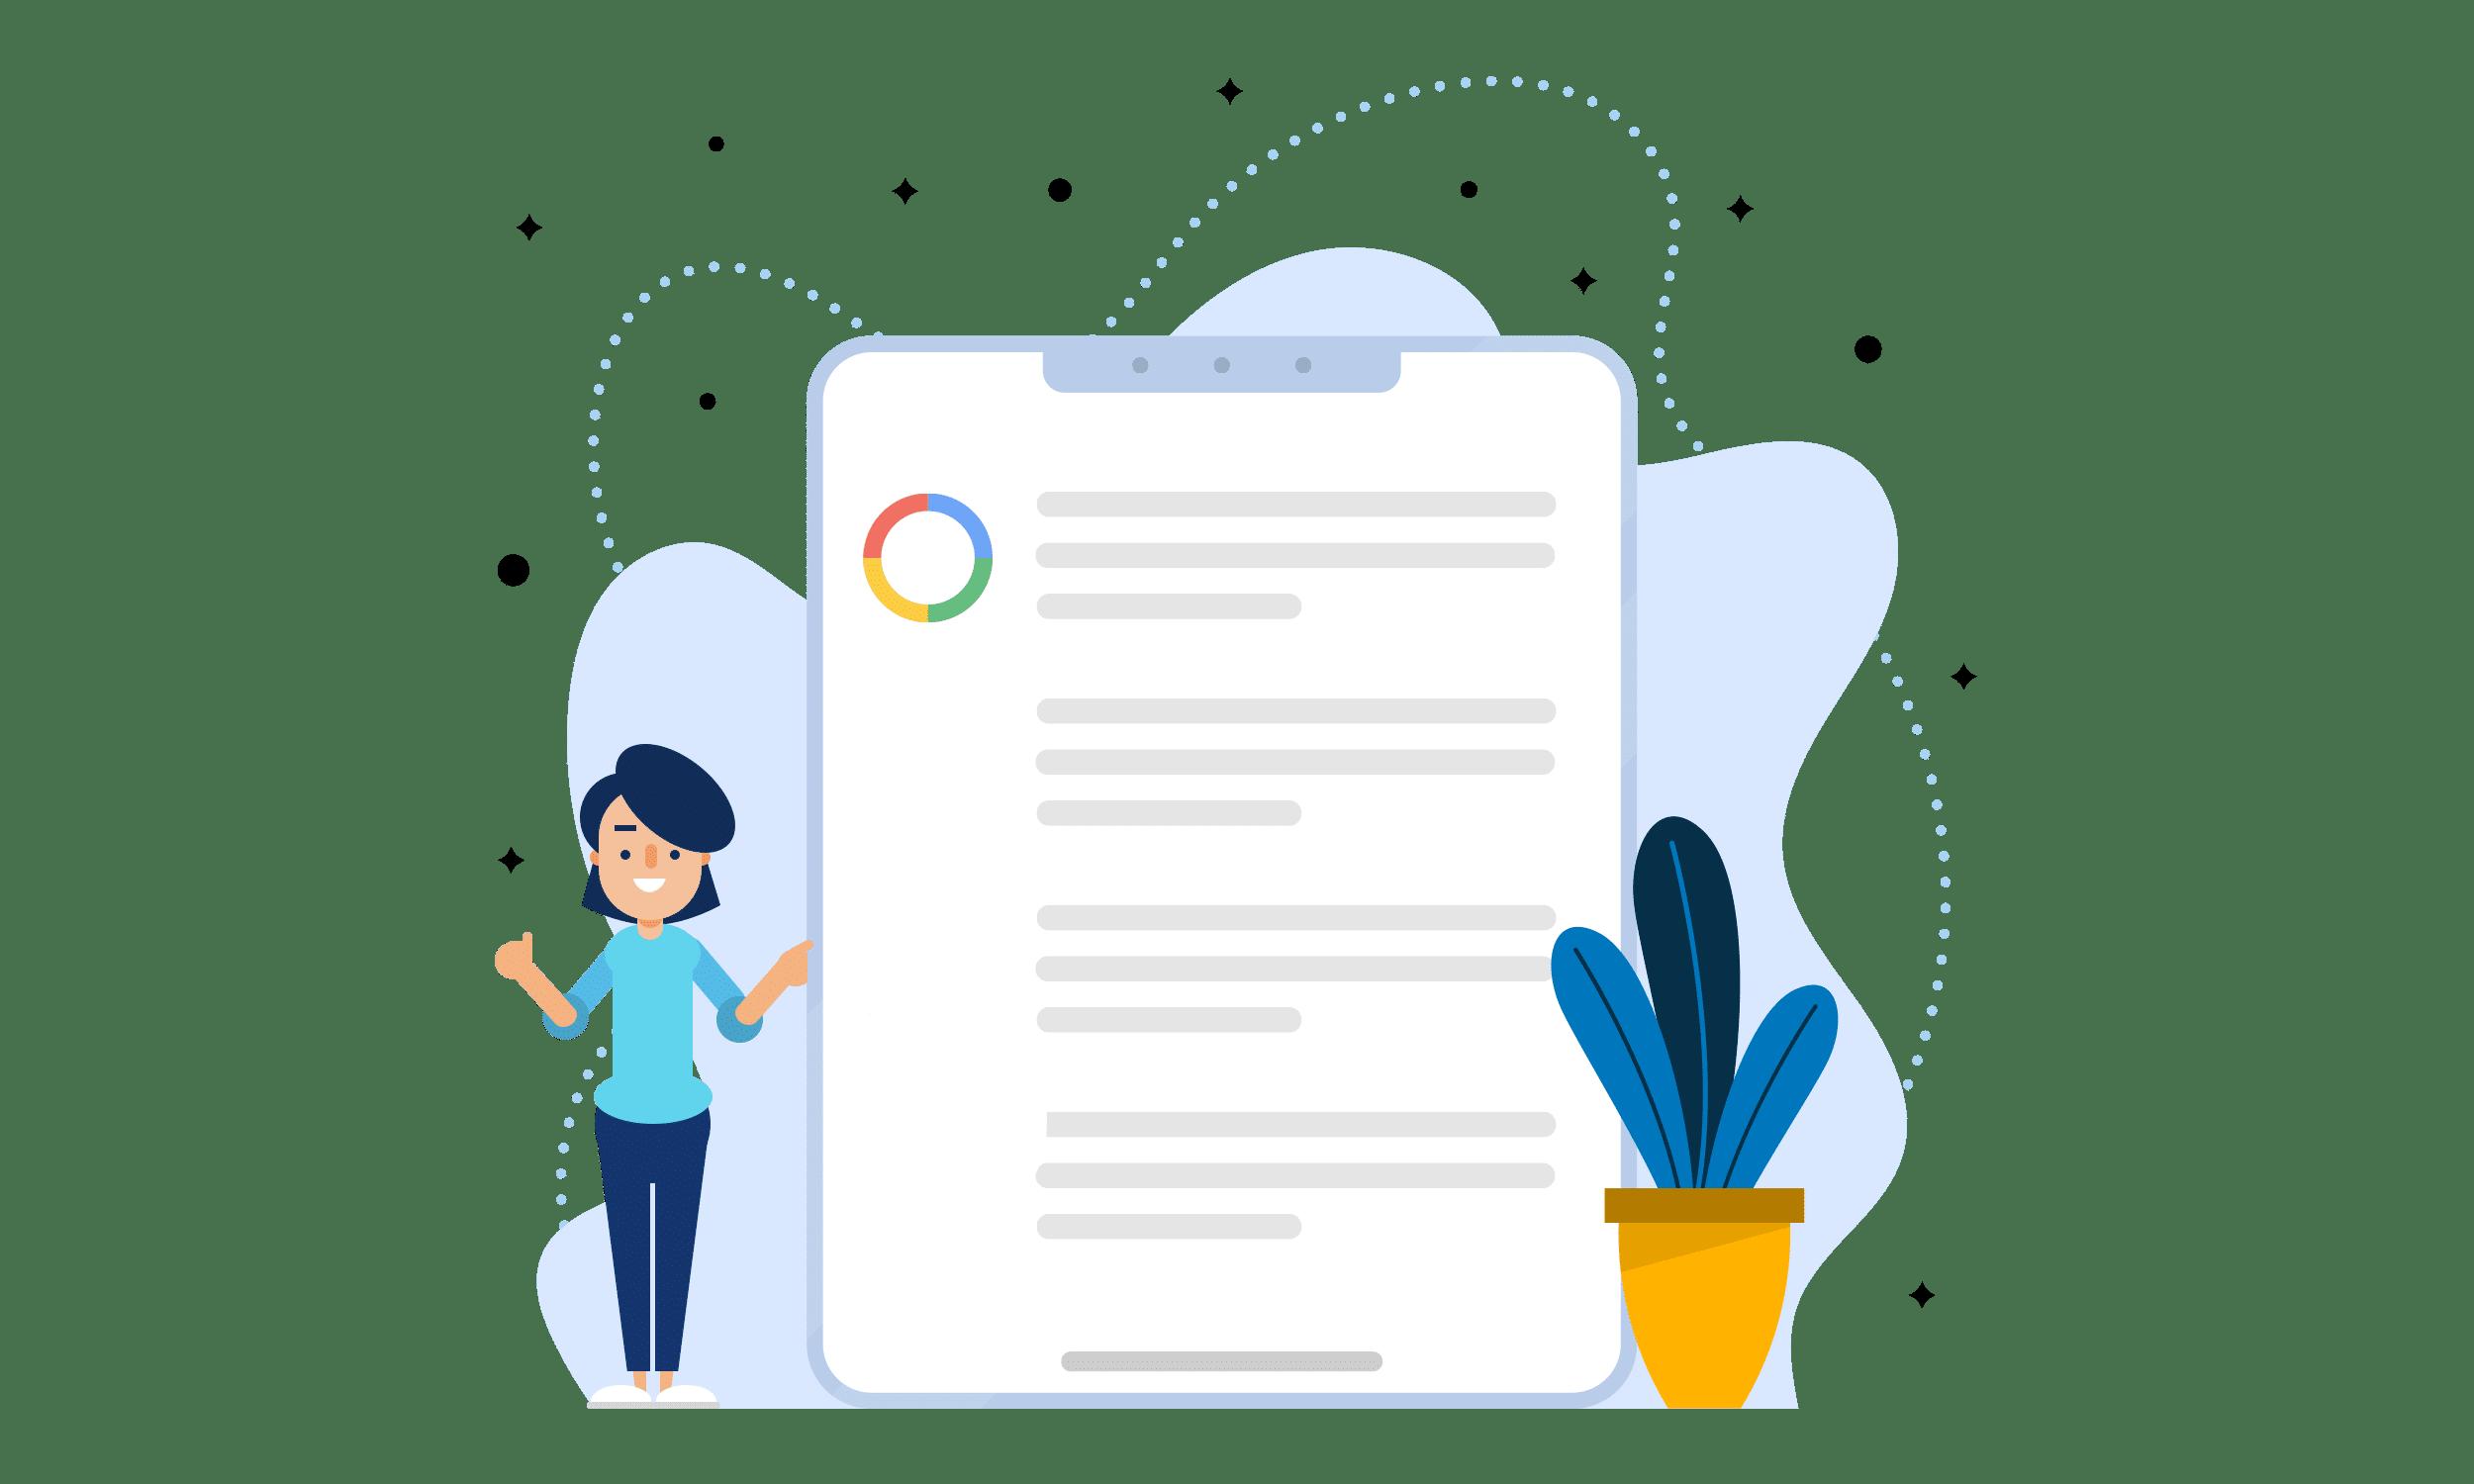 Hiver Shared Mailbox Collaboration Illustration